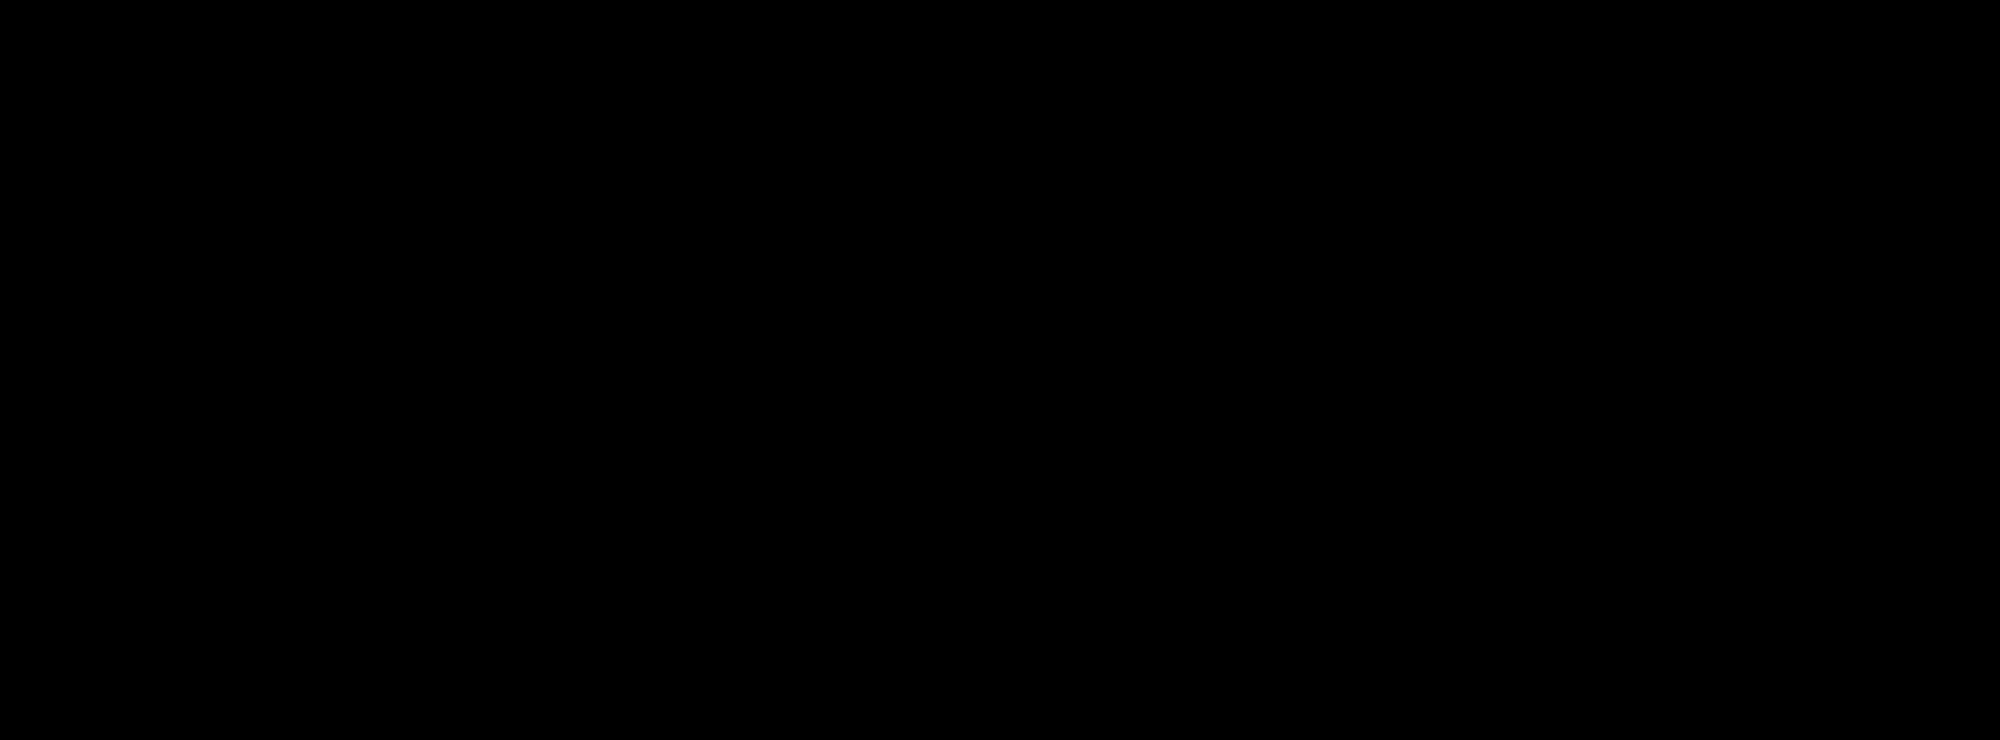 Dr. Mangat & Associates-logo-black.png